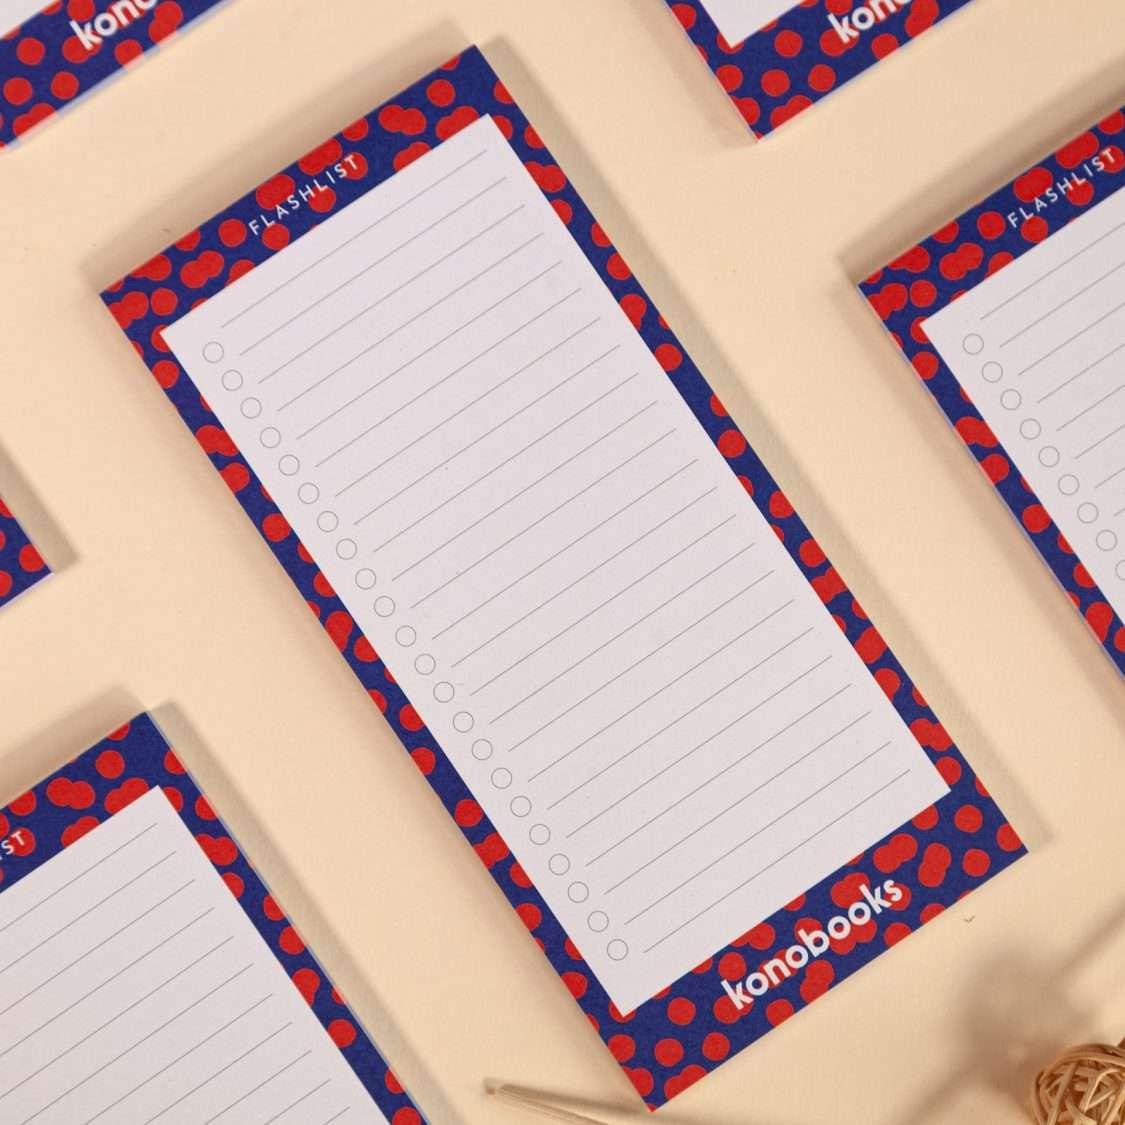 Flashlist - Block Notes To Do List Ecologico in carta riciclata al 100%